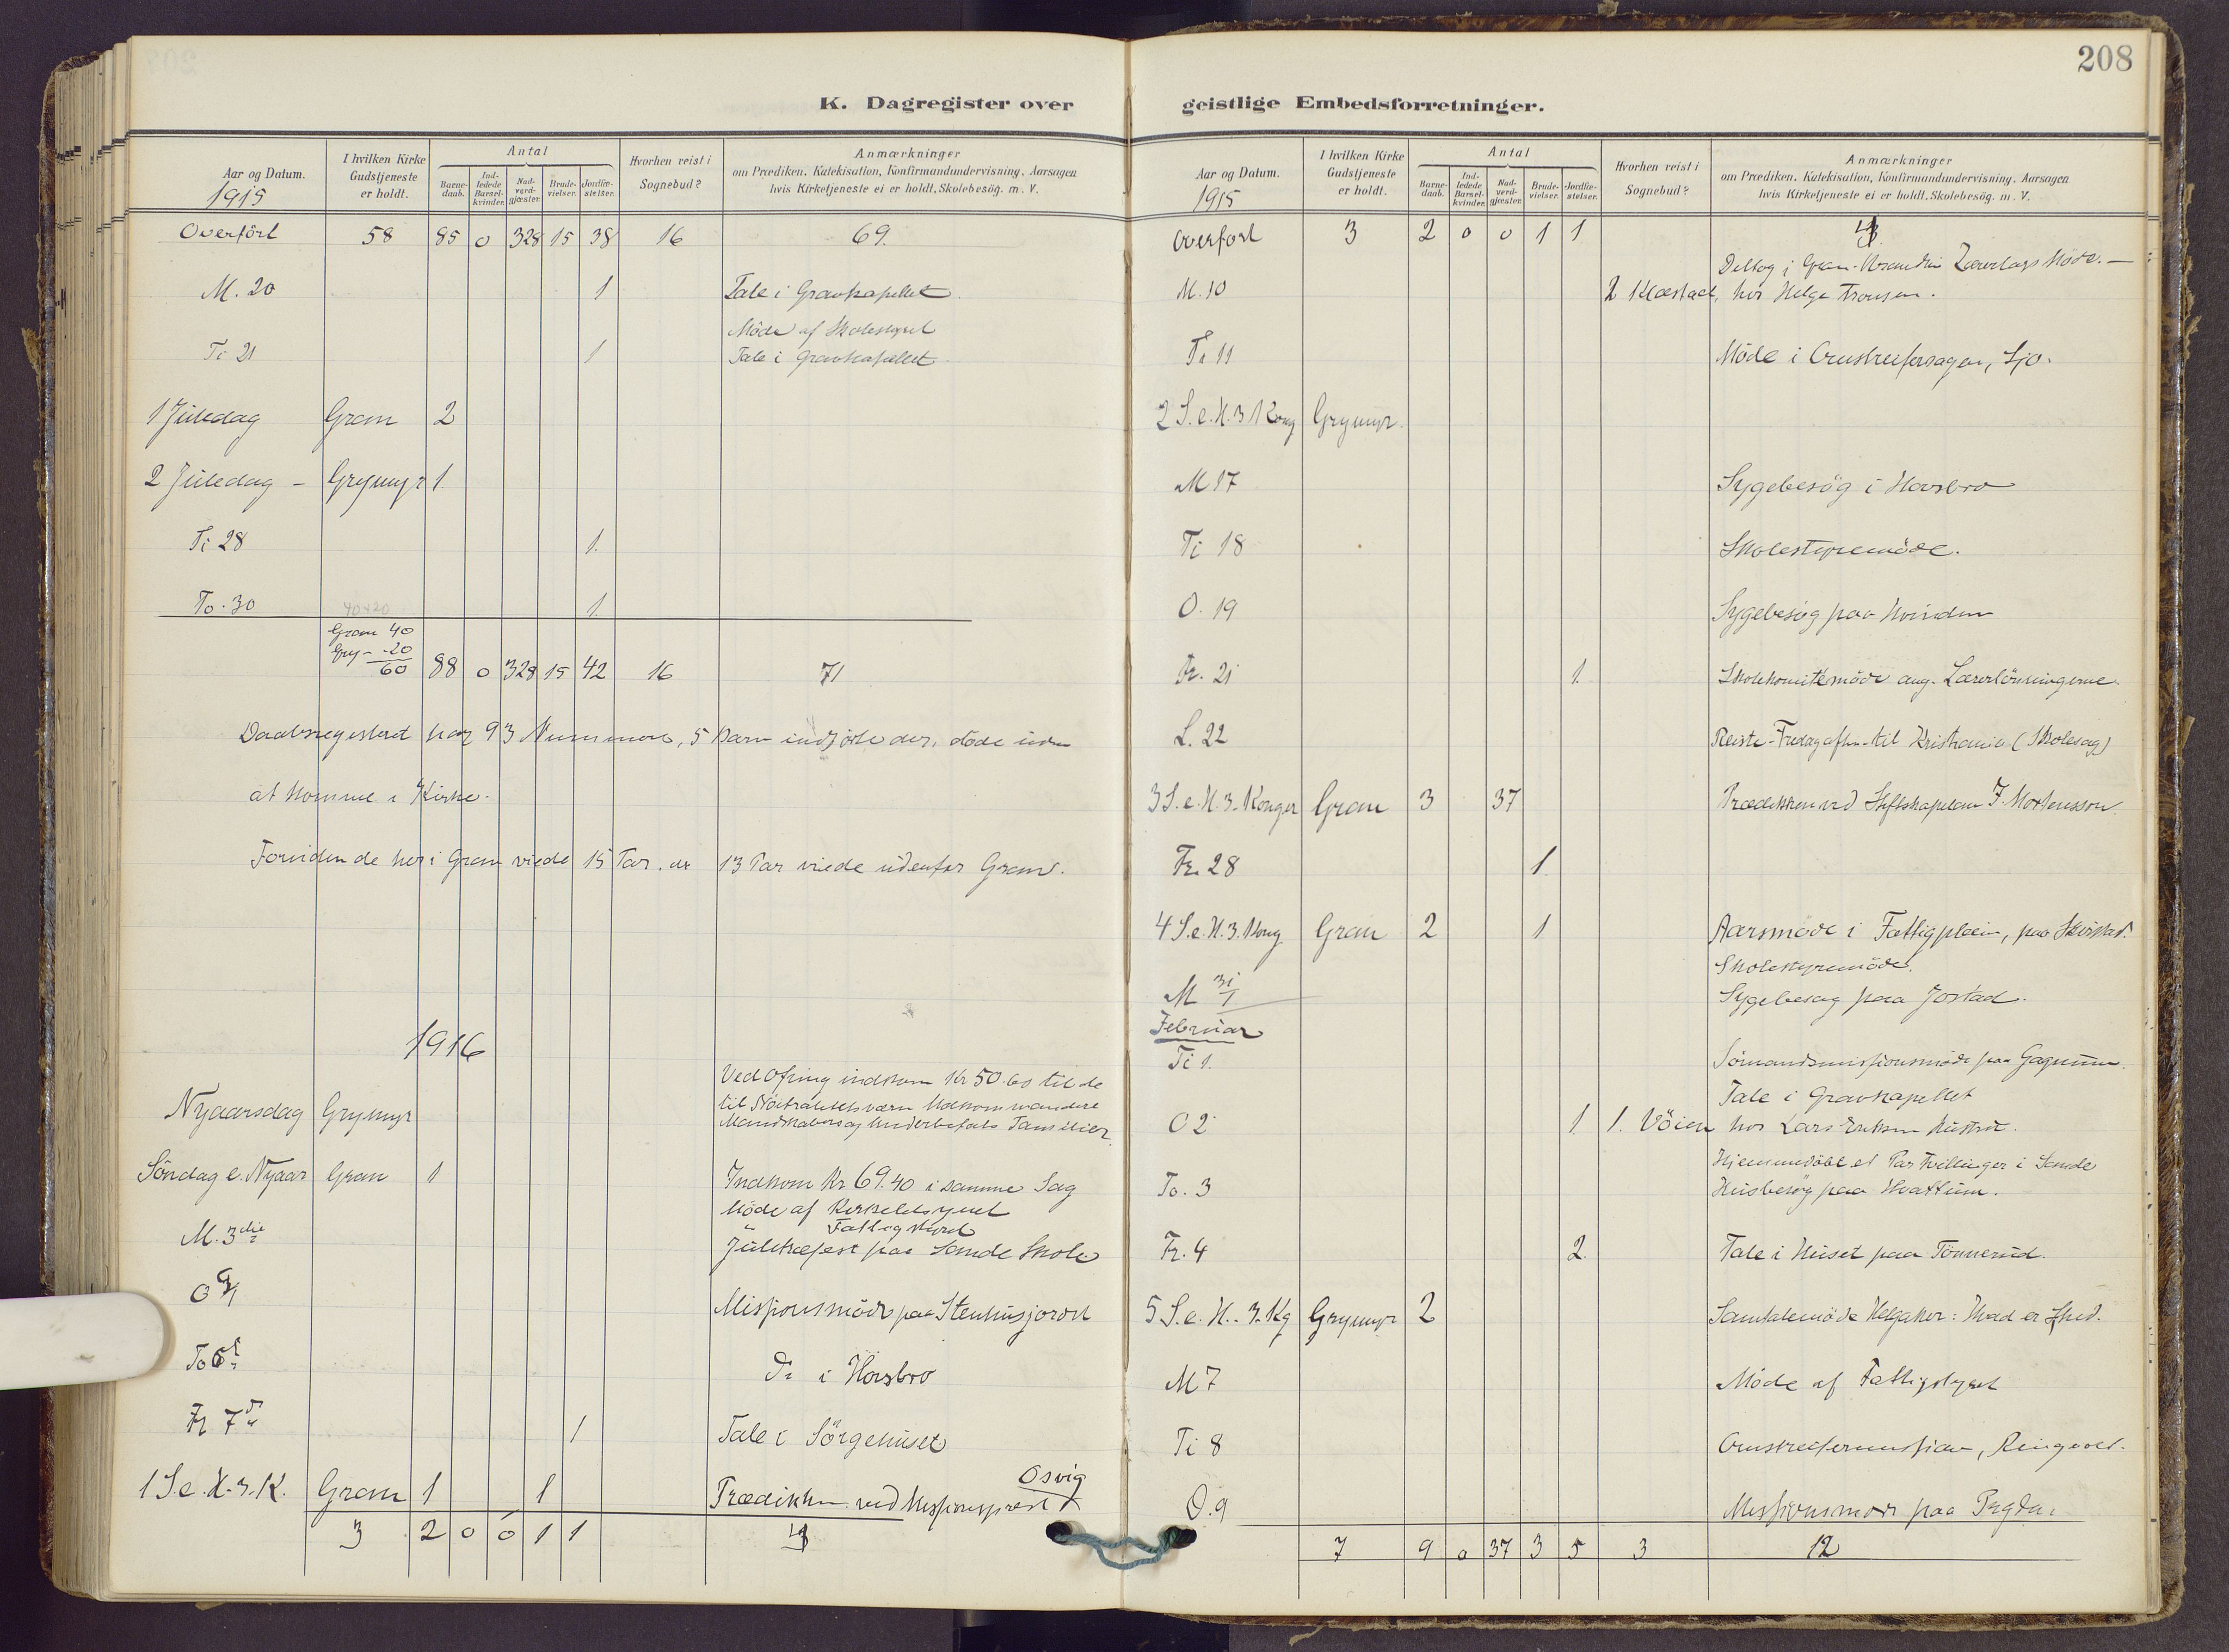 SAH, Gran prestekontor, Ministerialbok nr. 22, 1908-1918, s. 208